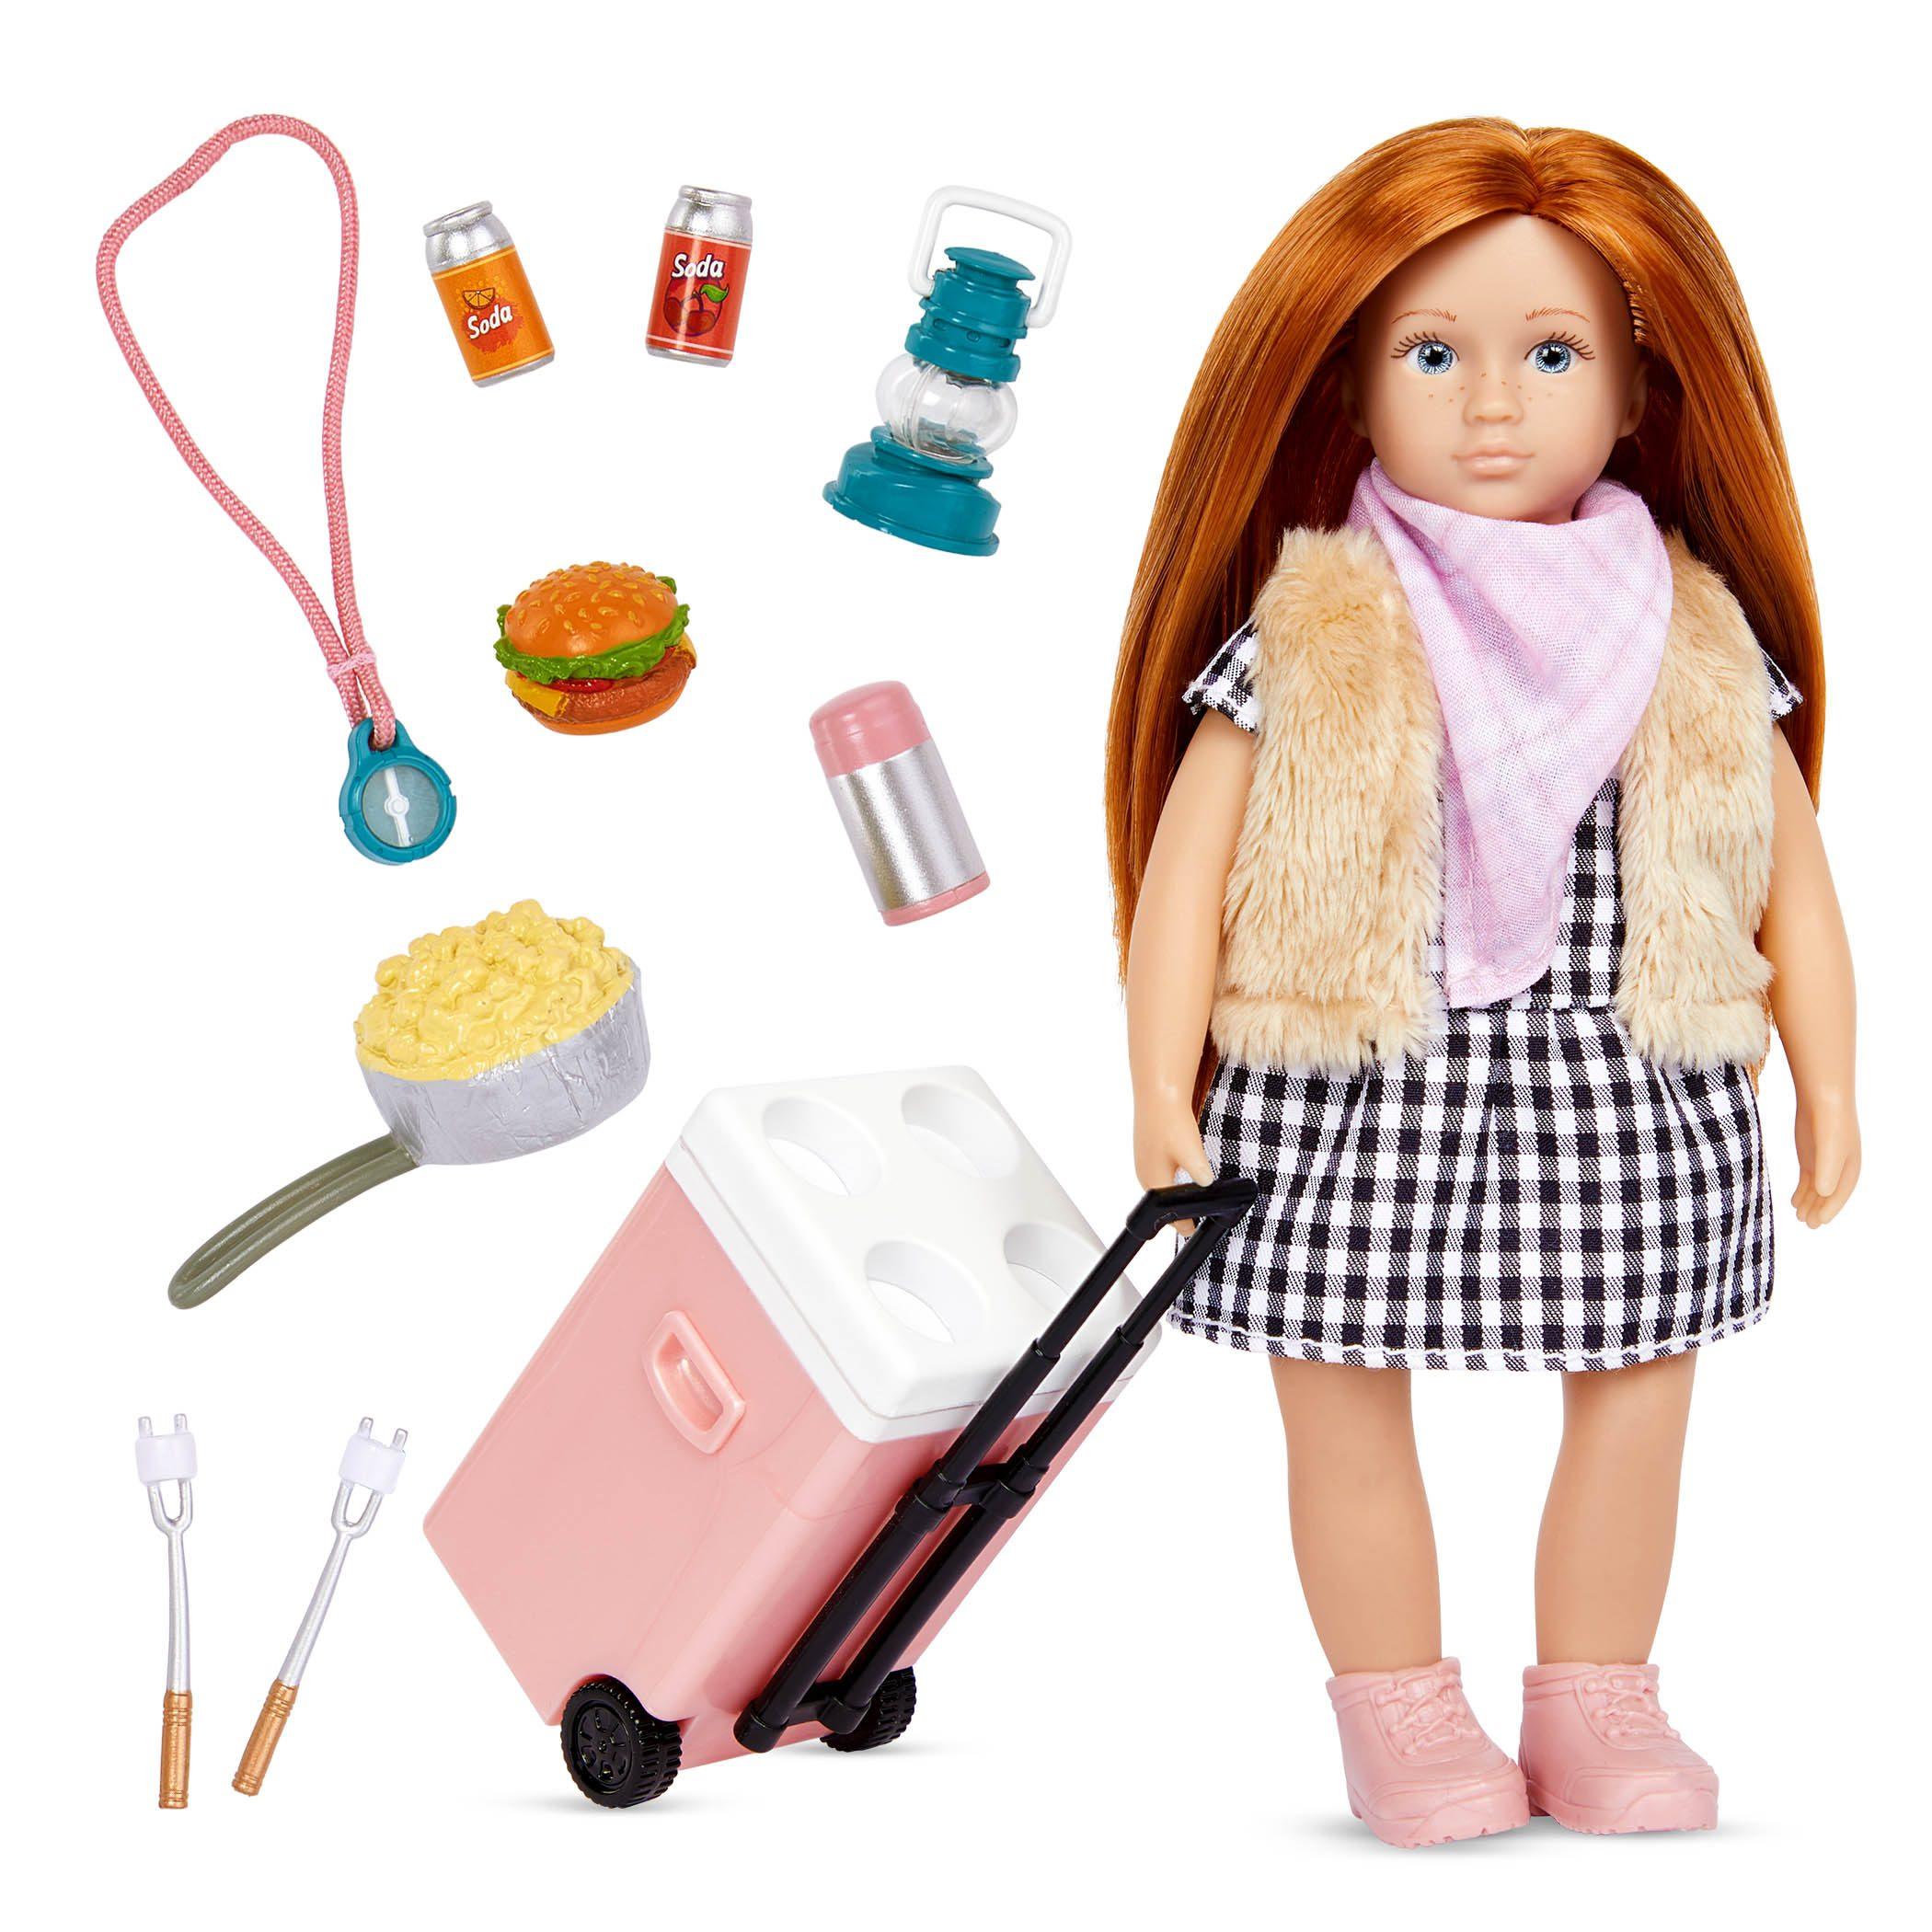 Jenna's Camp Set | 6-inch Doll & Accessories | Lori